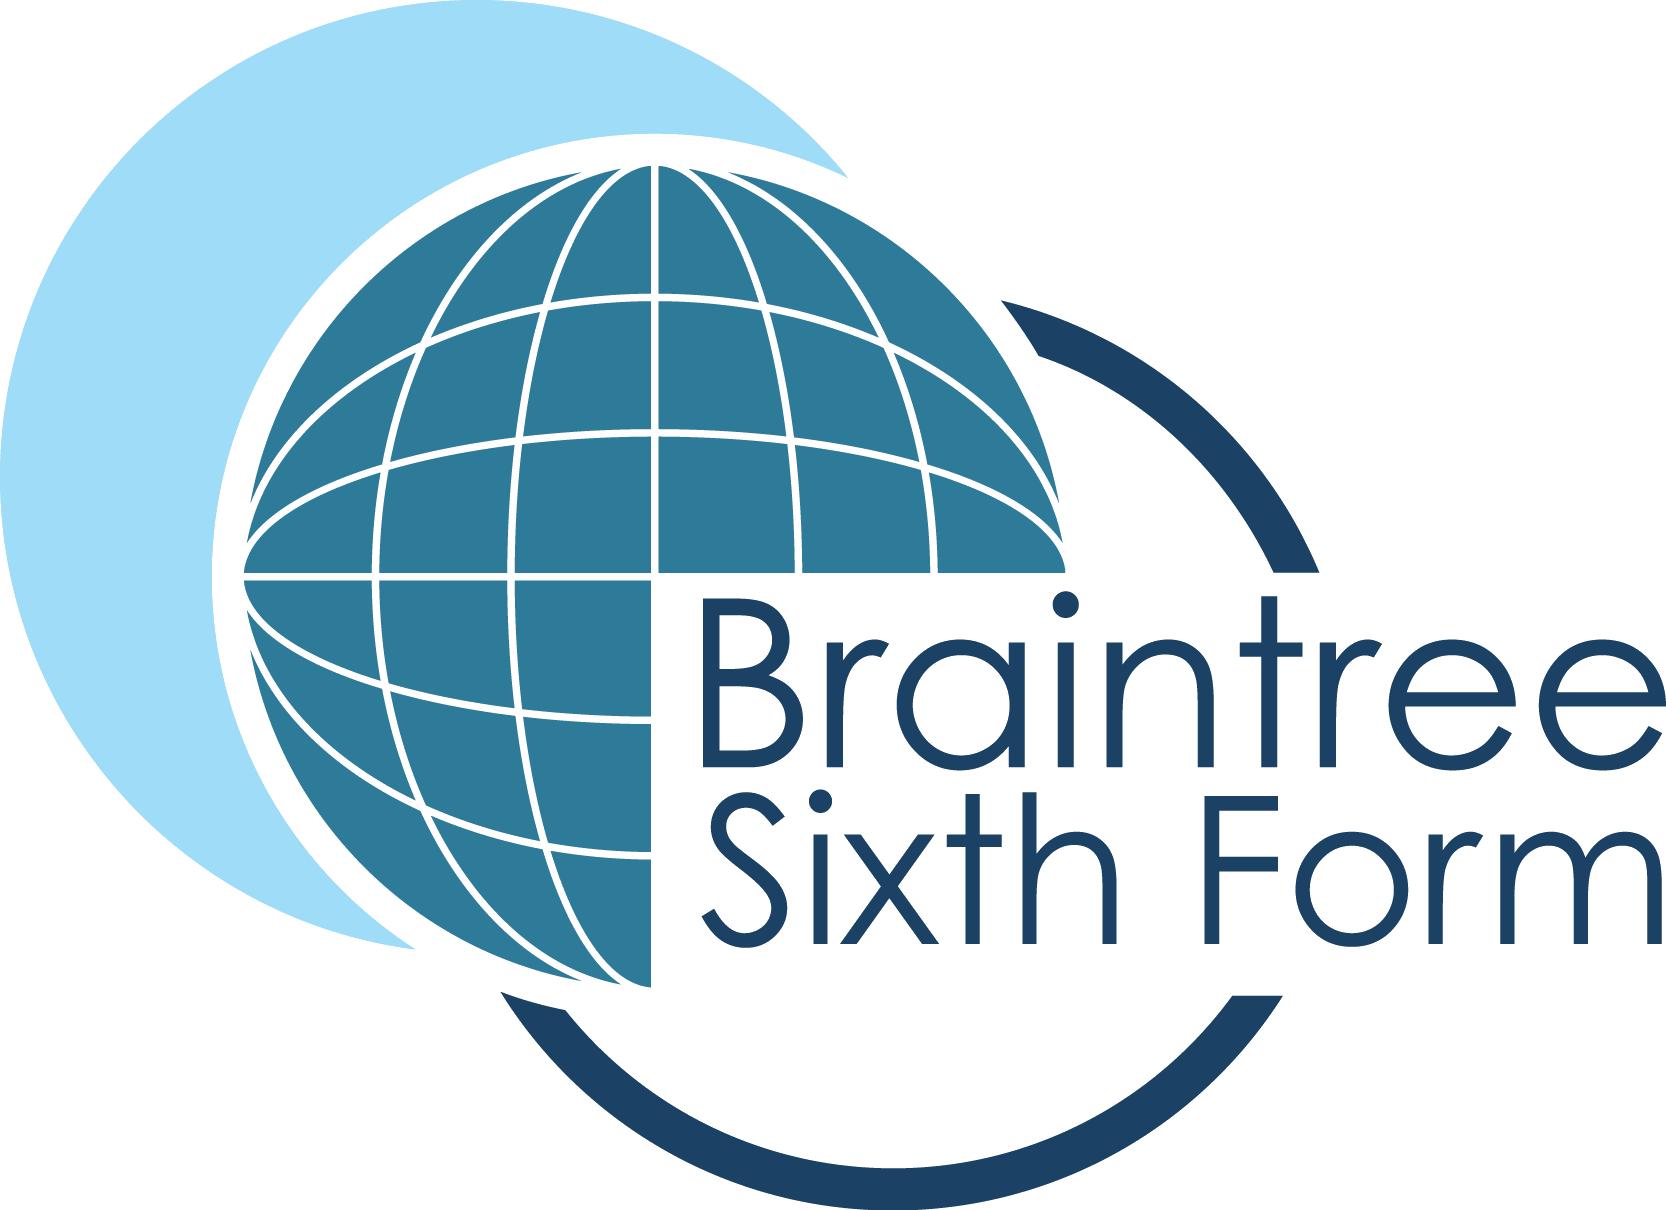 Braintree Sixth Form